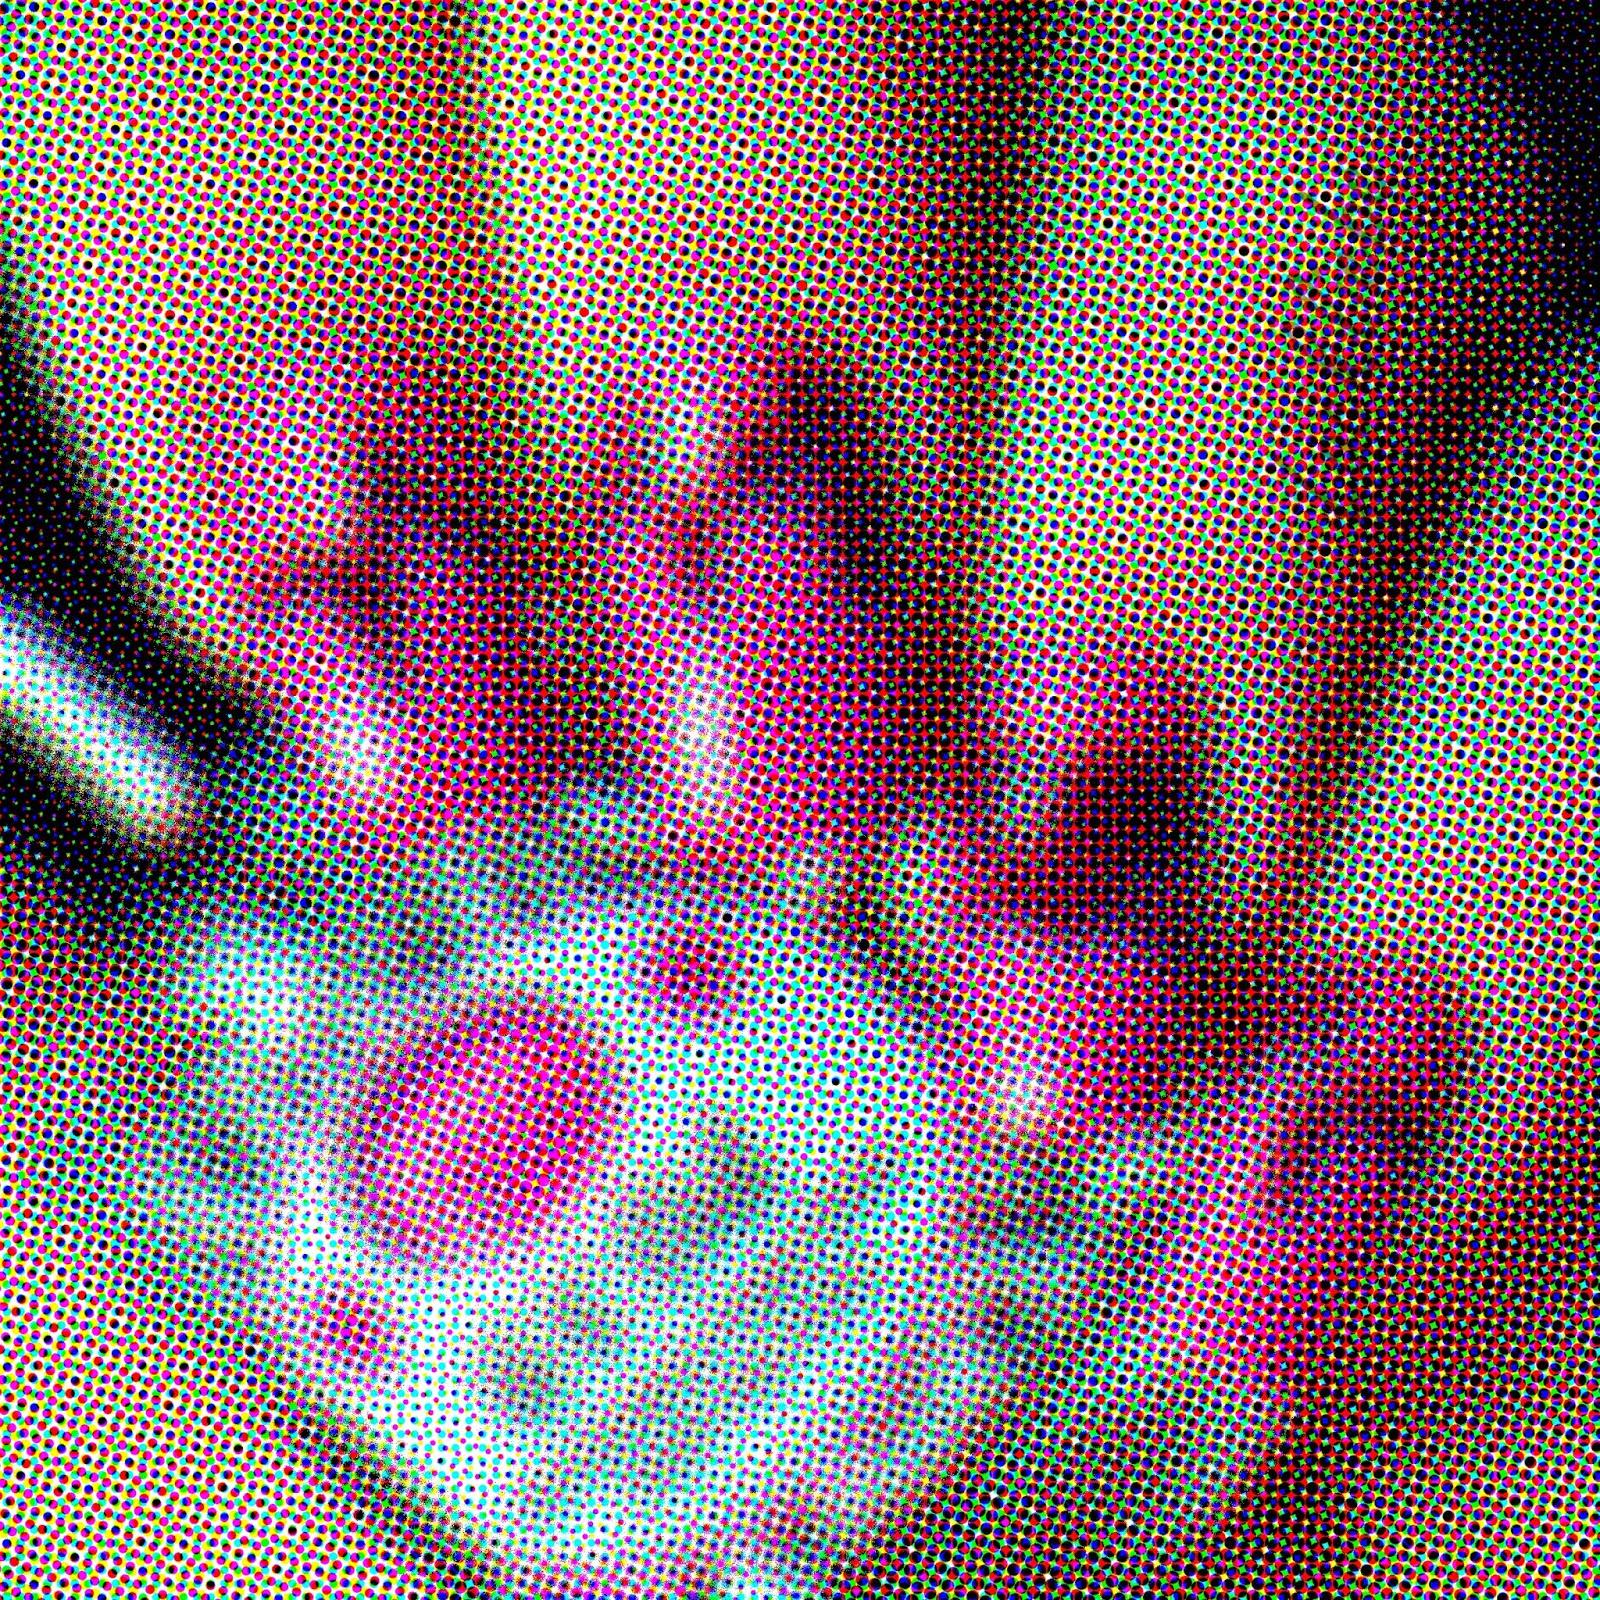 http://rainpow-nails.blogspot.com/2015/02/valentinstag-heartbeat.html